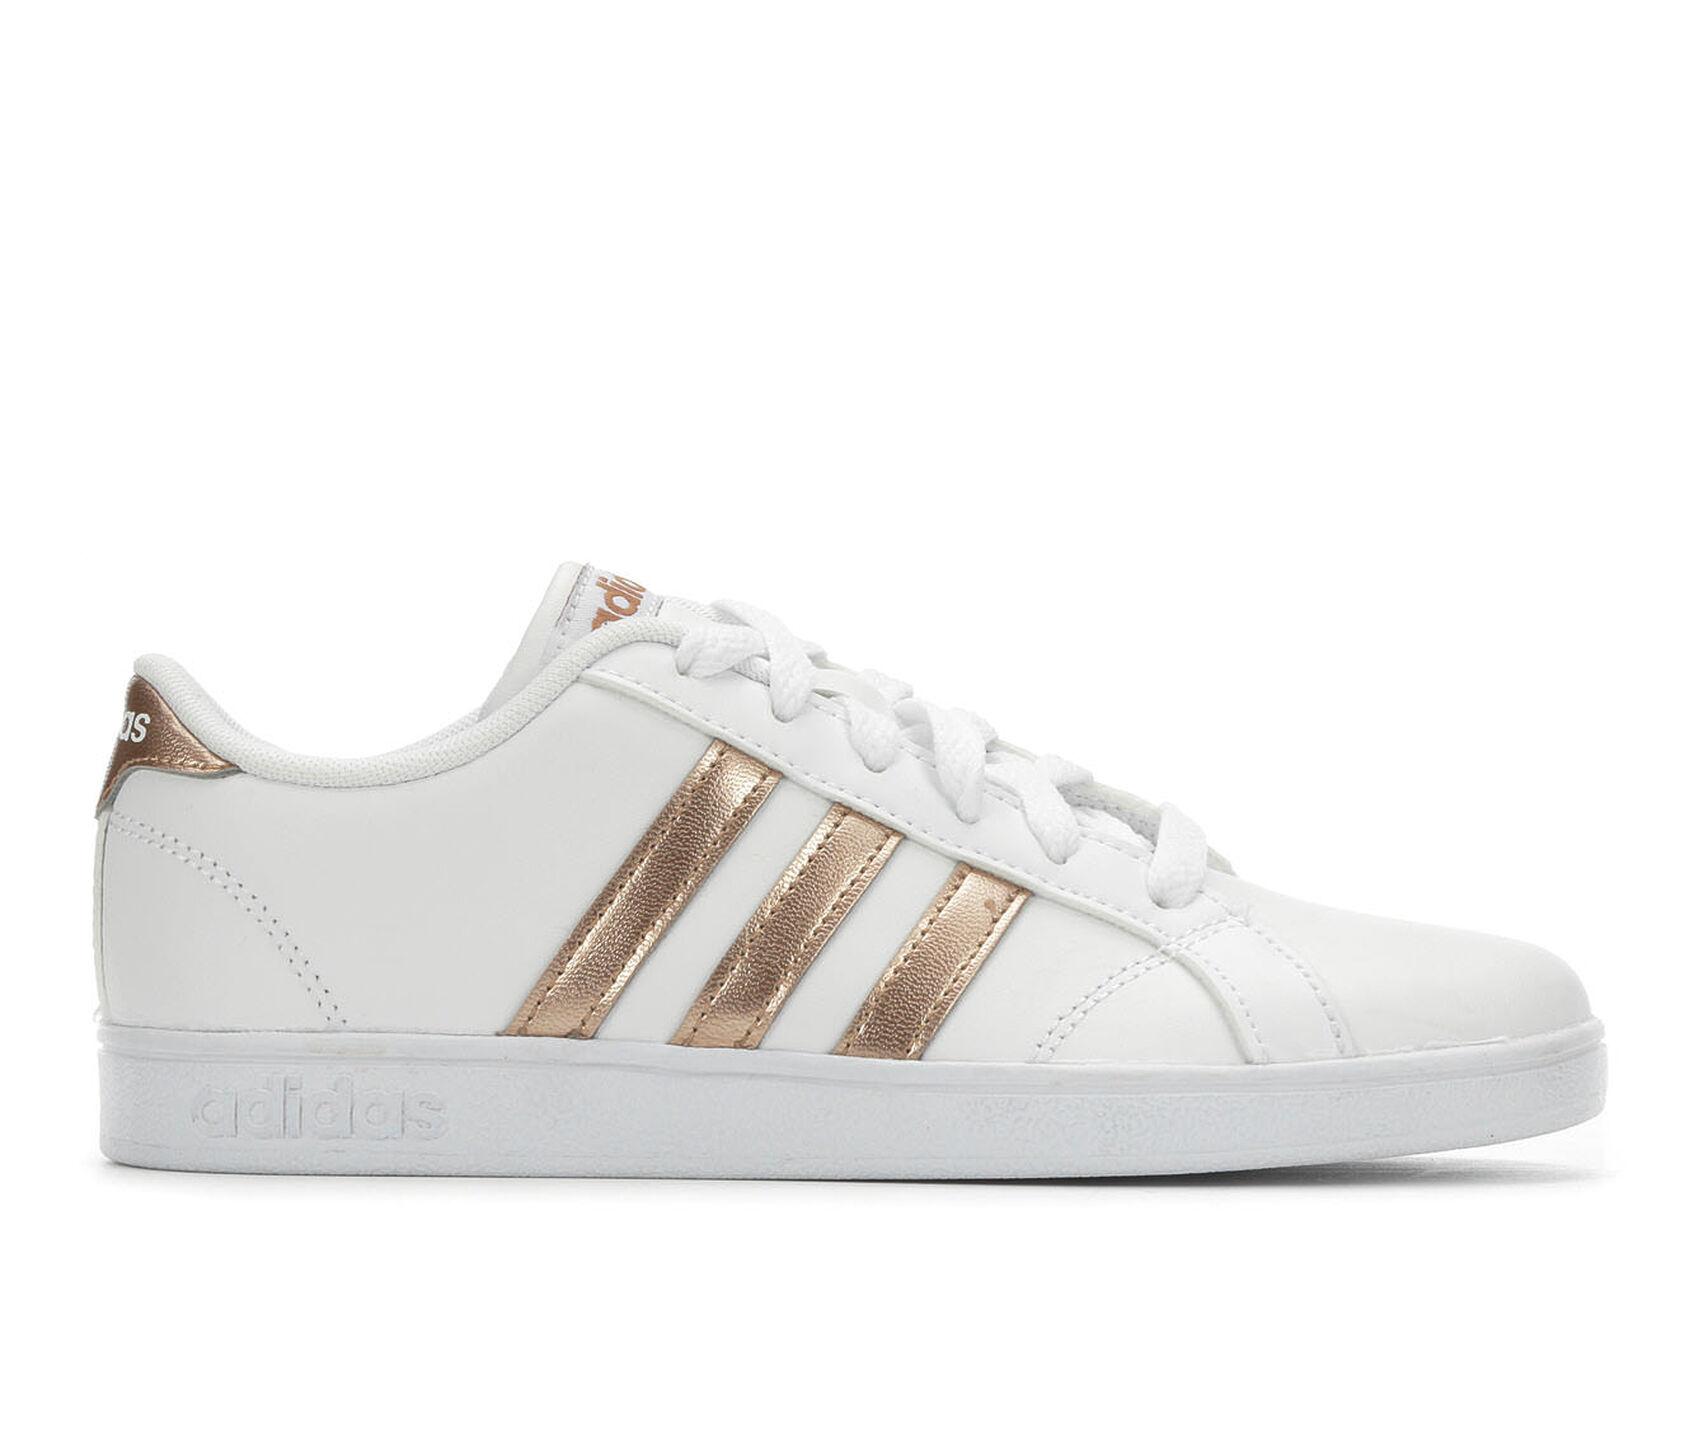 87f5b279d777 Girls  Adidas Little Kid   Big Kid Baseline Sneakers